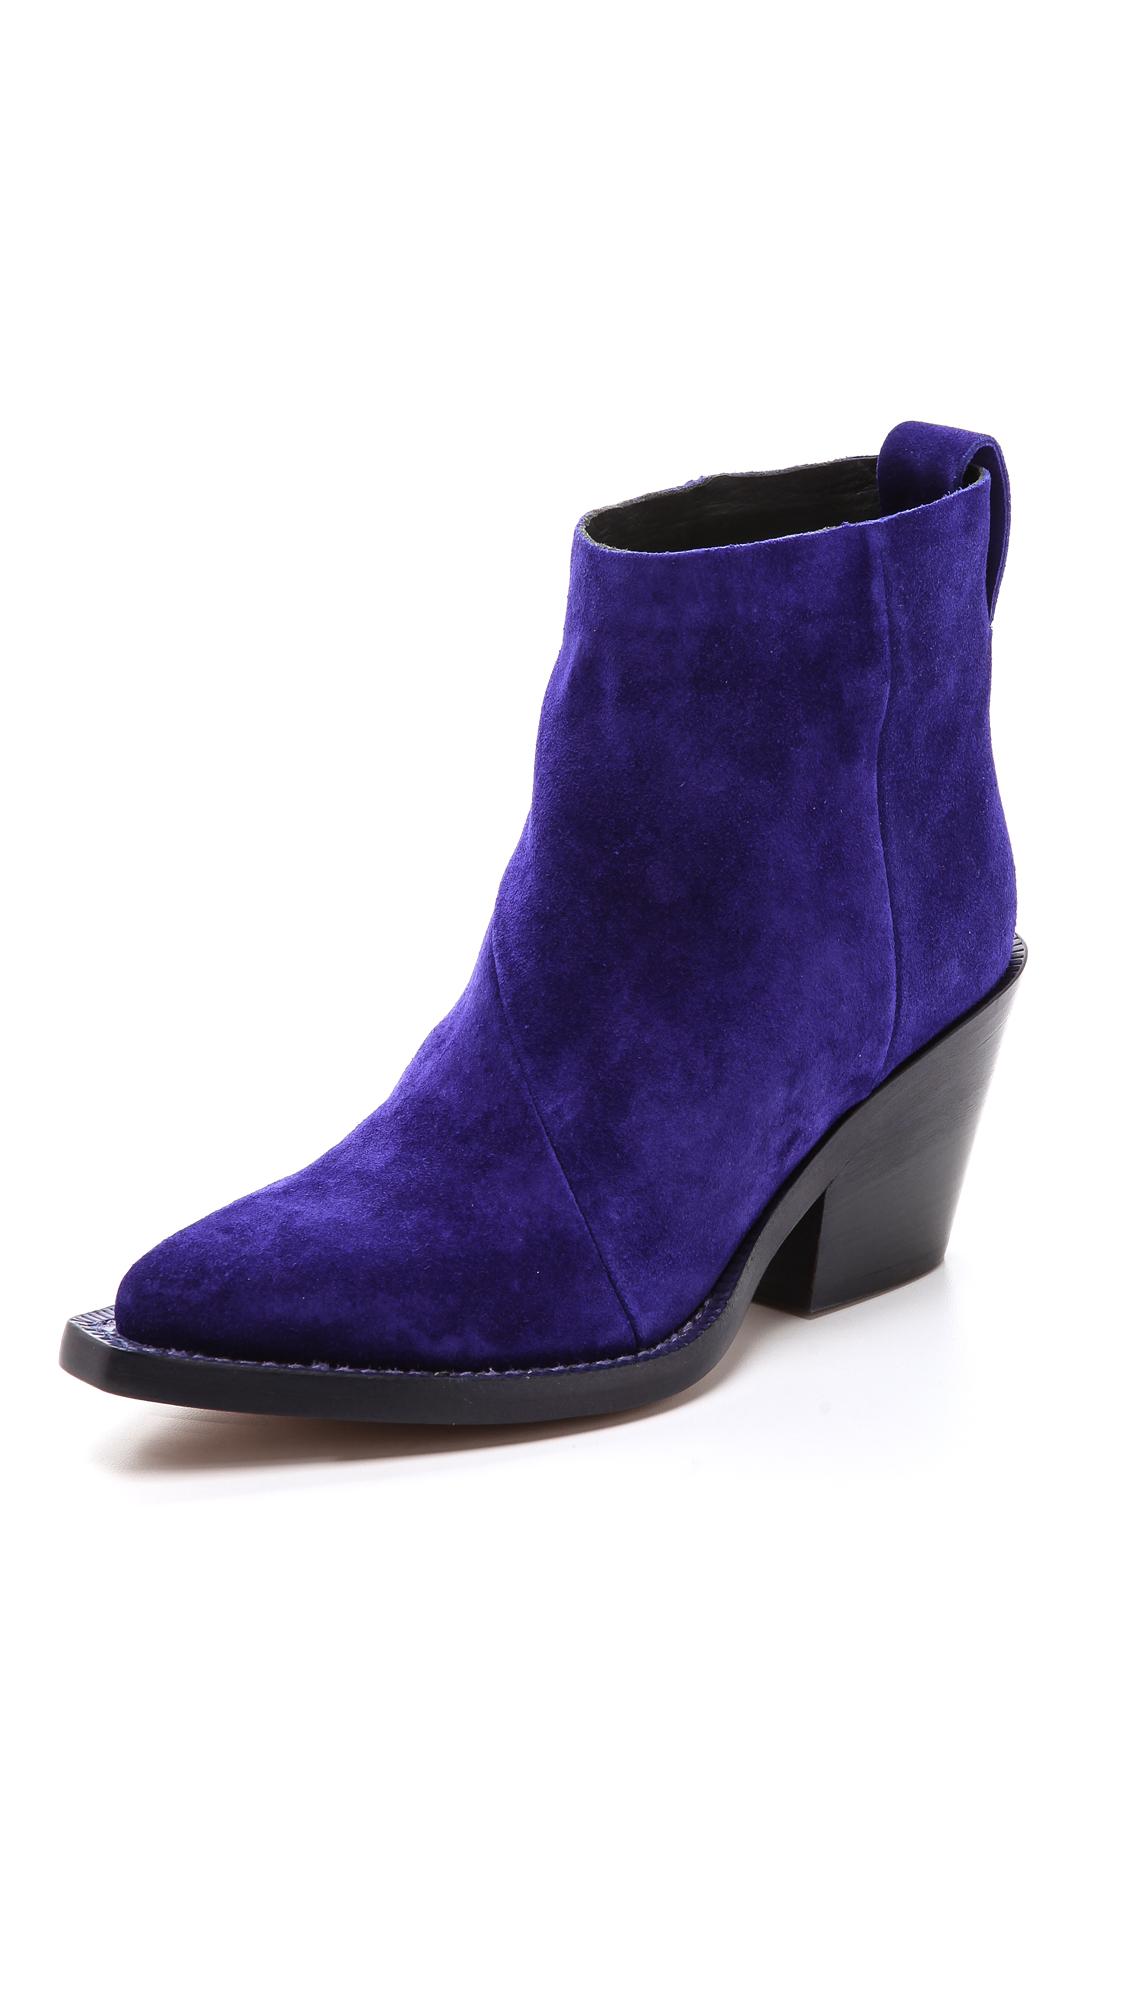 best service 1a93f 6460e Acne Studios Donna Suede Boots  SHOPBOP